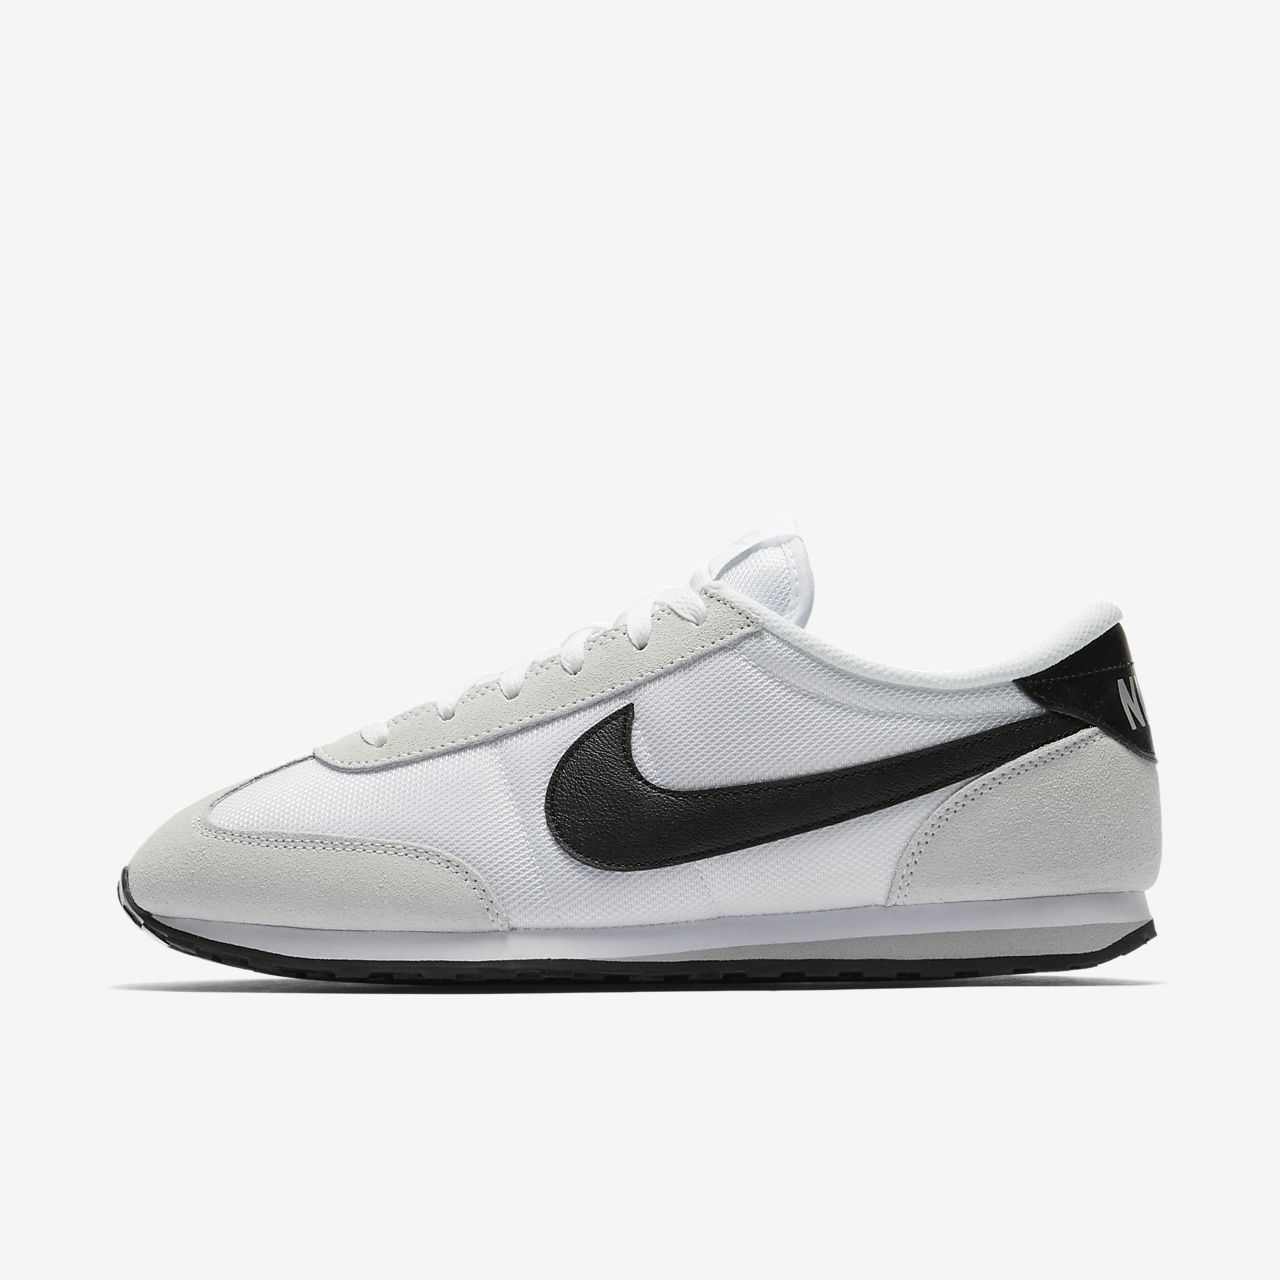 034efad970d45 Nike Mach Runner Men s Shoe. Nike.com GB